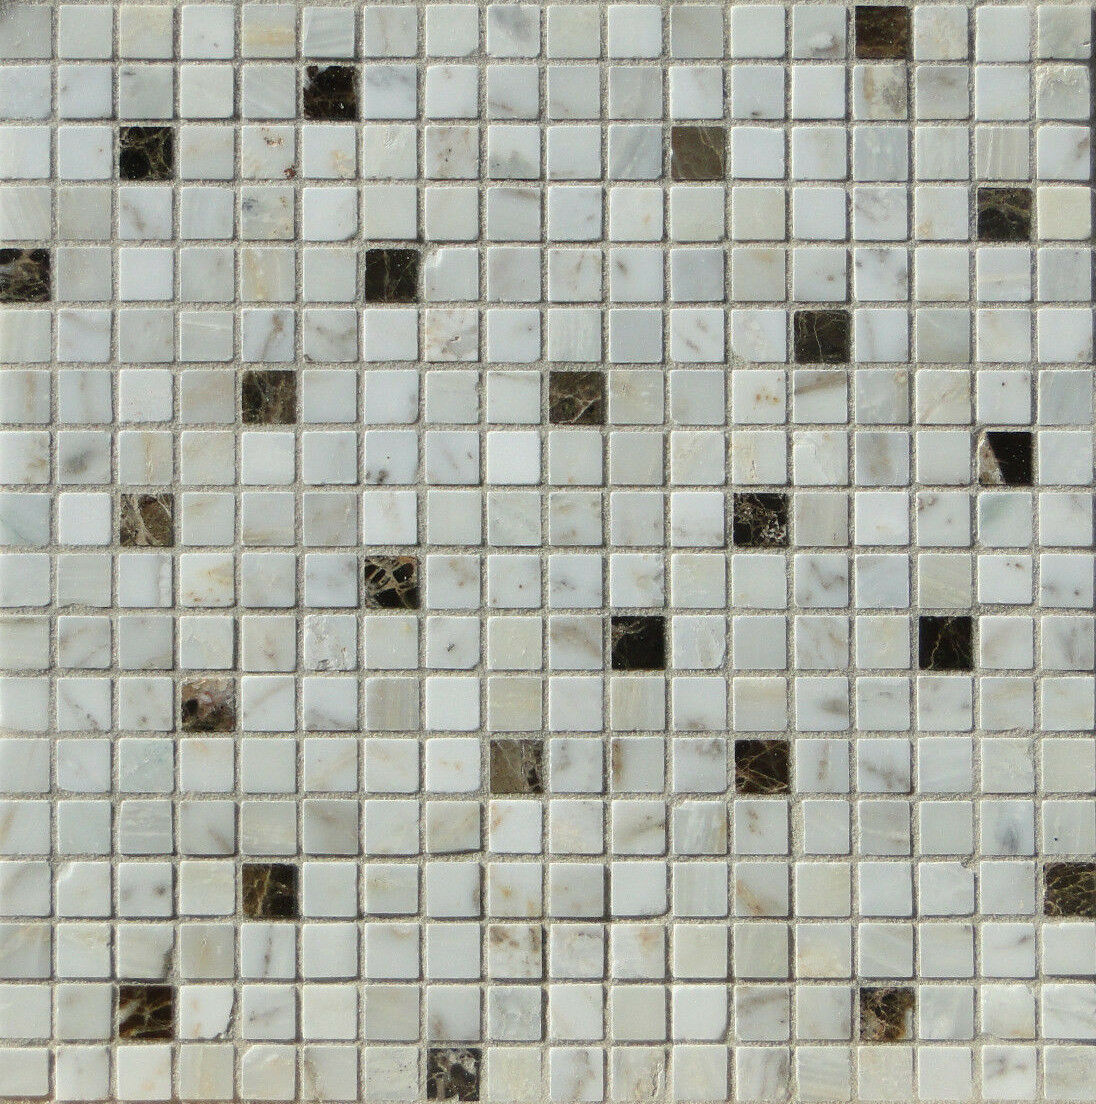 1qm Marmormosaik Mosaikfliese weiß braun 30x30x0,8cm, 1,5x1,5, AKTION